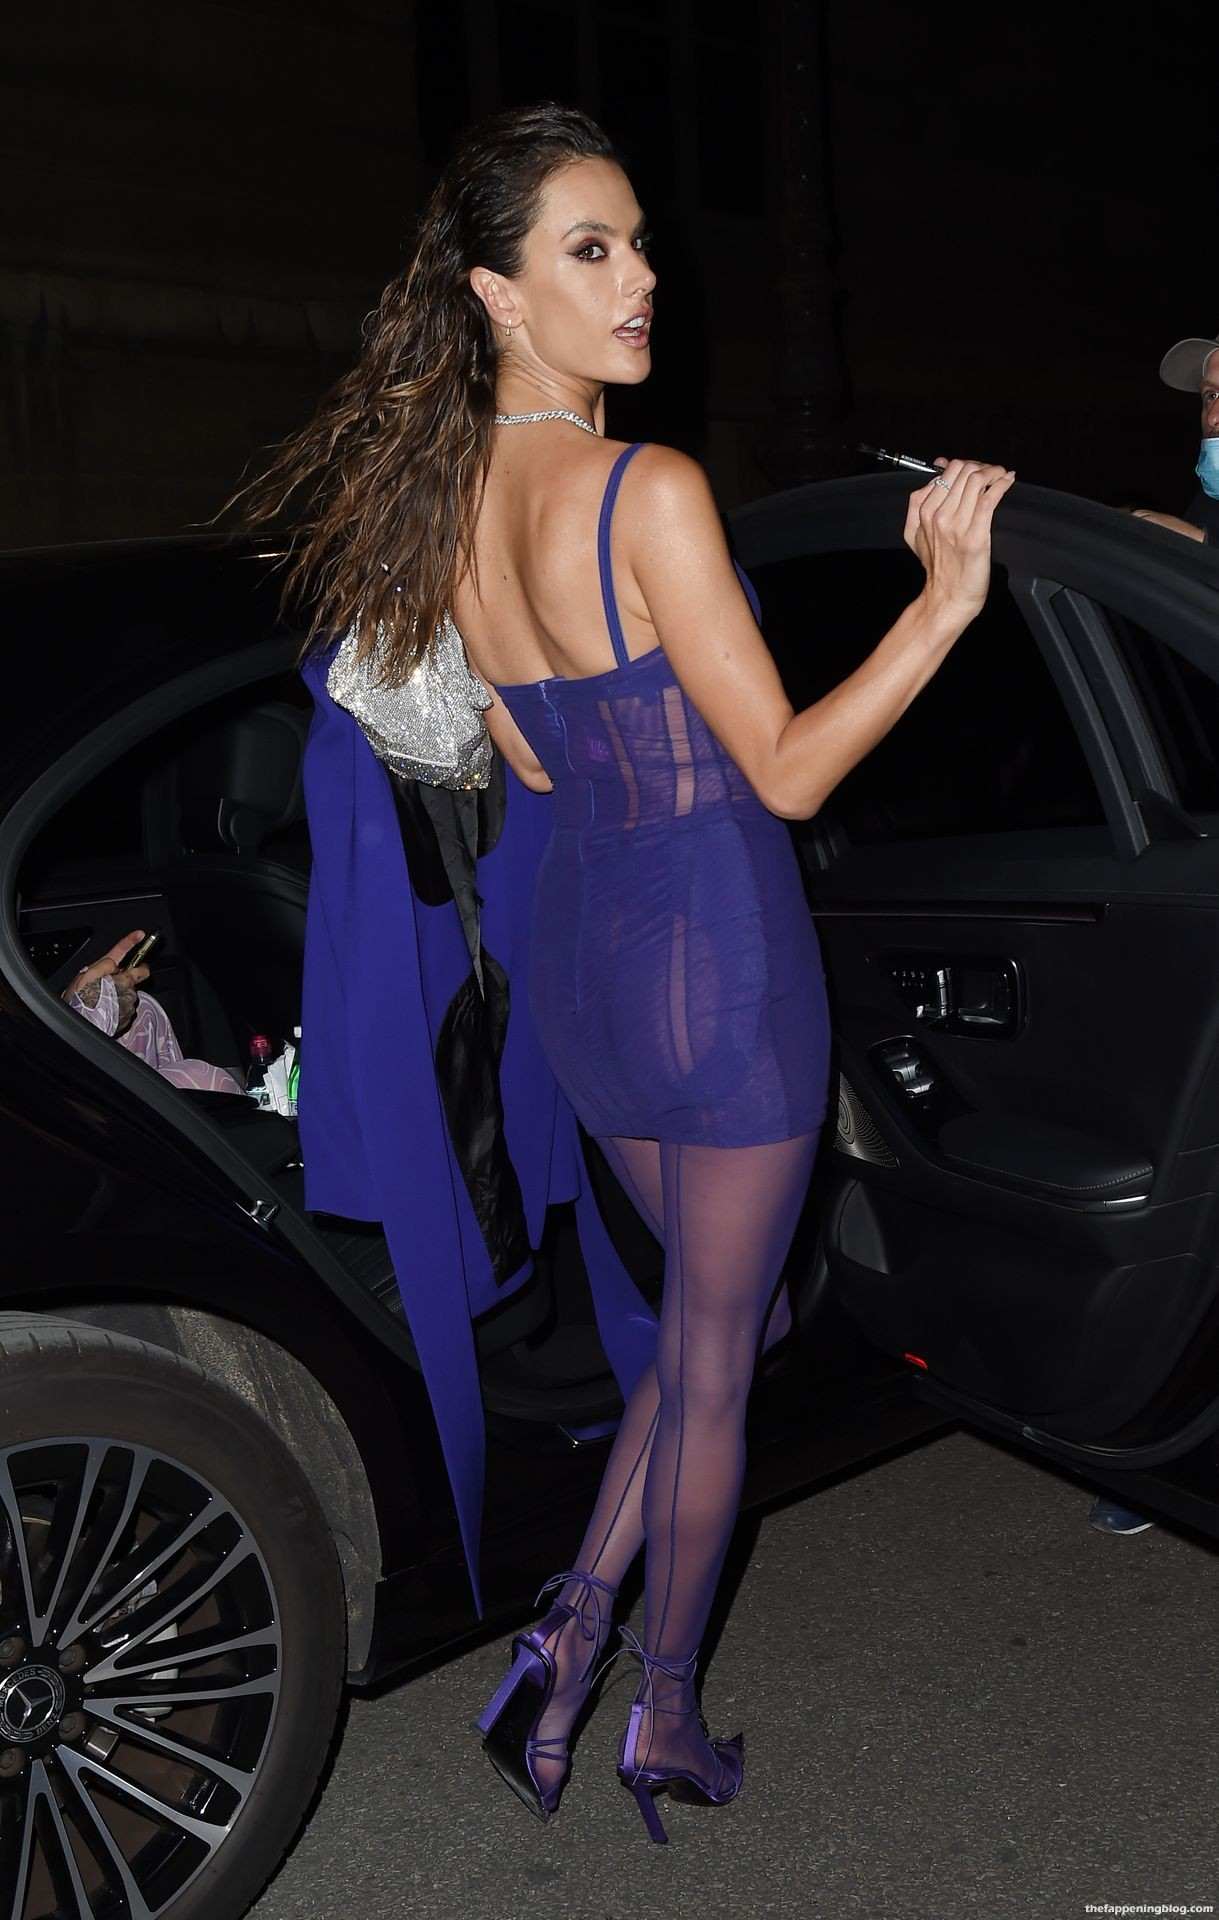 Alessandra-Ambrosio-Sexy-The-Fappening-Blog-29-3.jpg